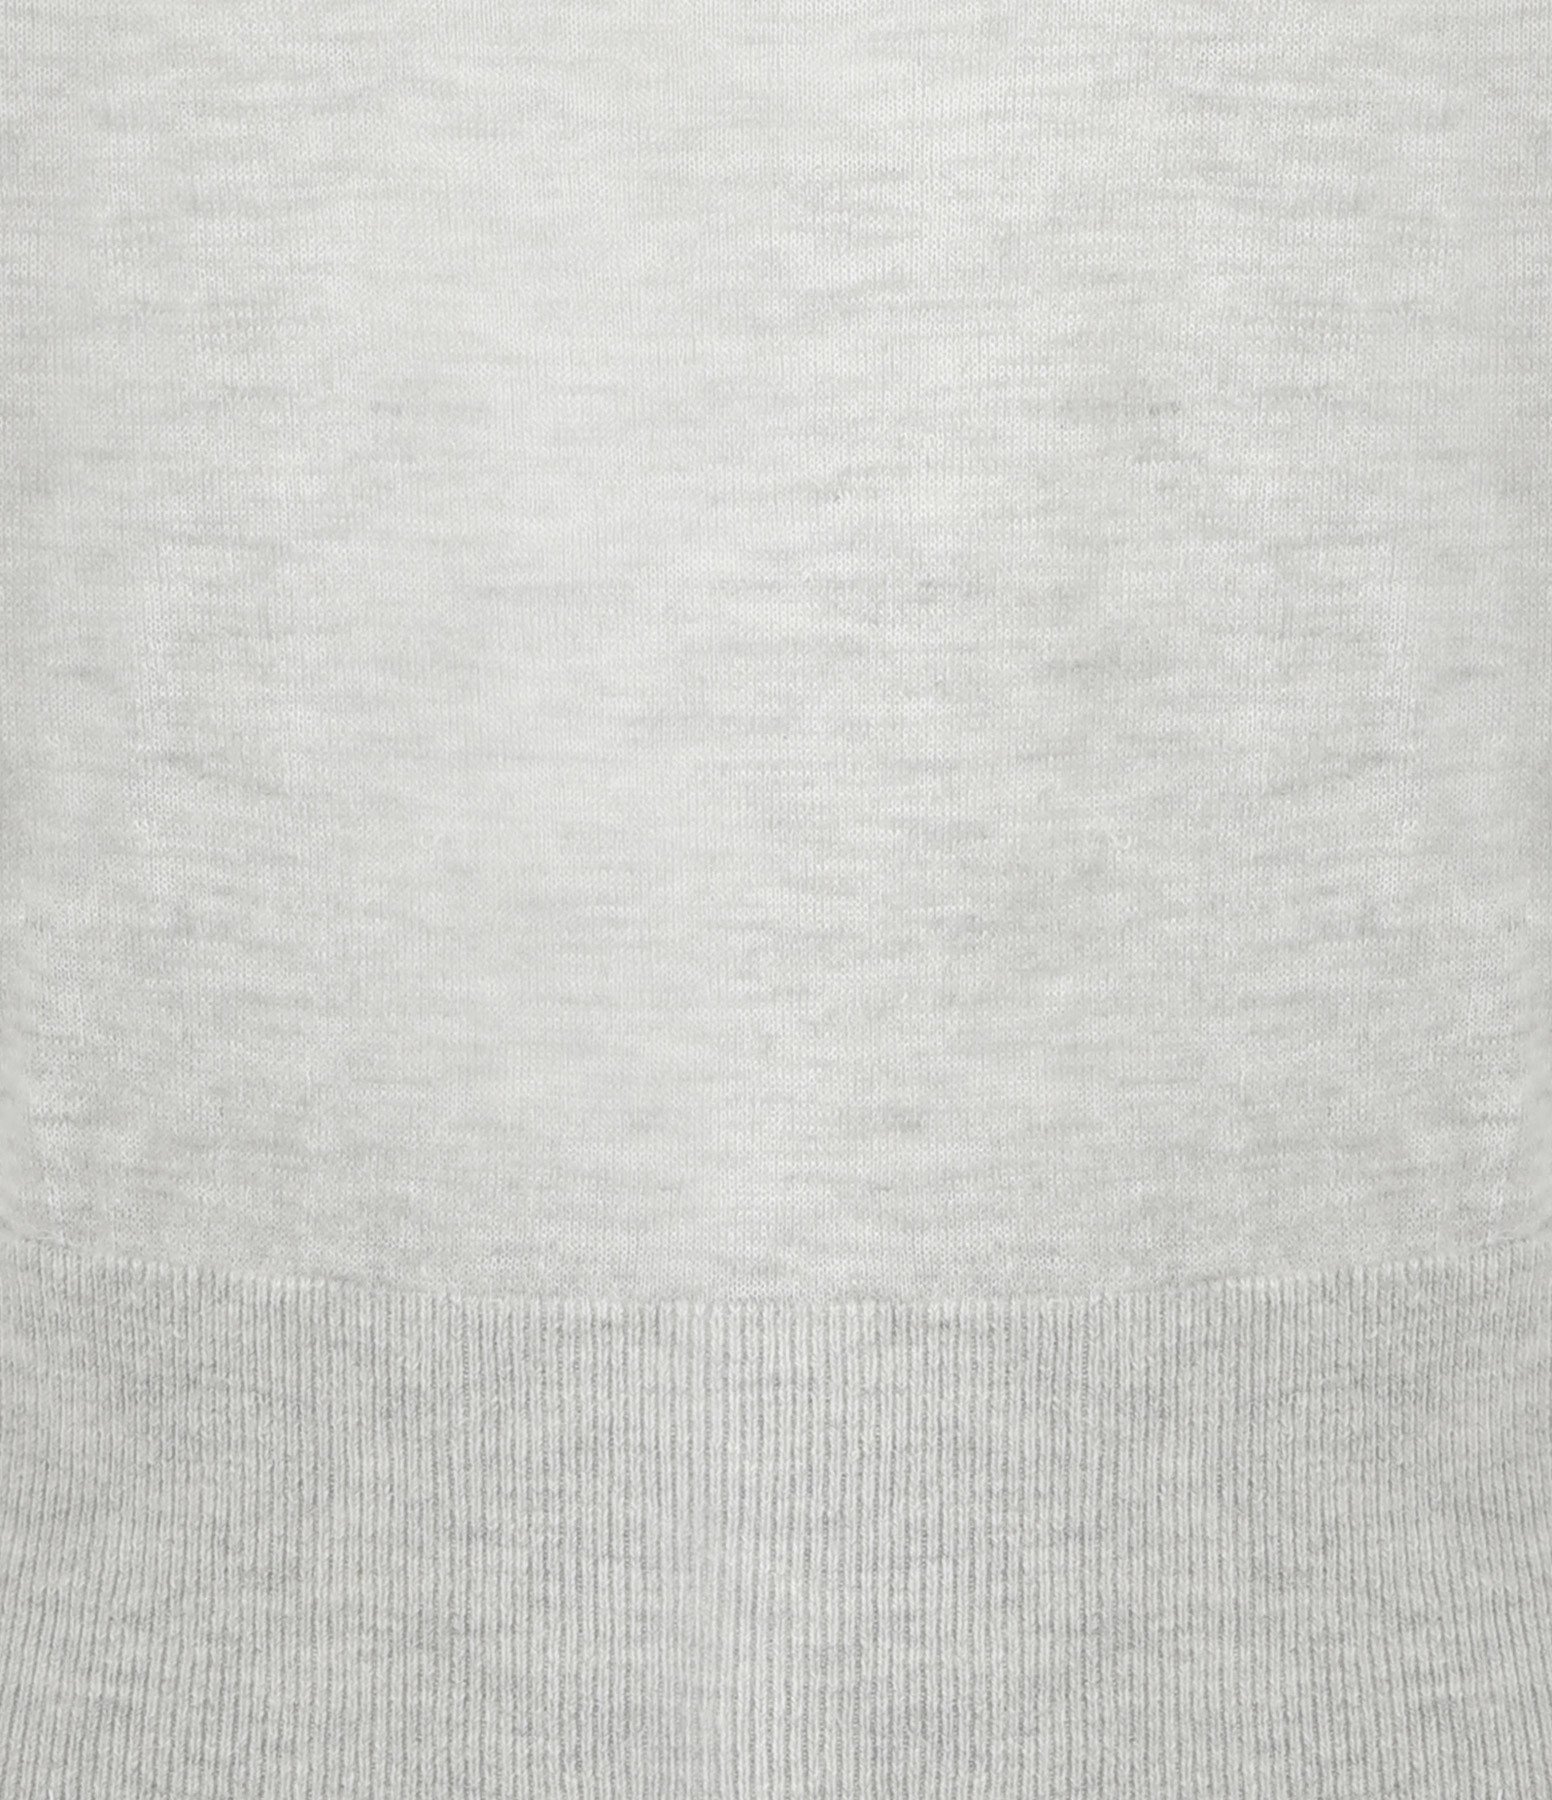 ISABEL MARANT ÉTOILE - Pull Flint Alpaga Gris Clair